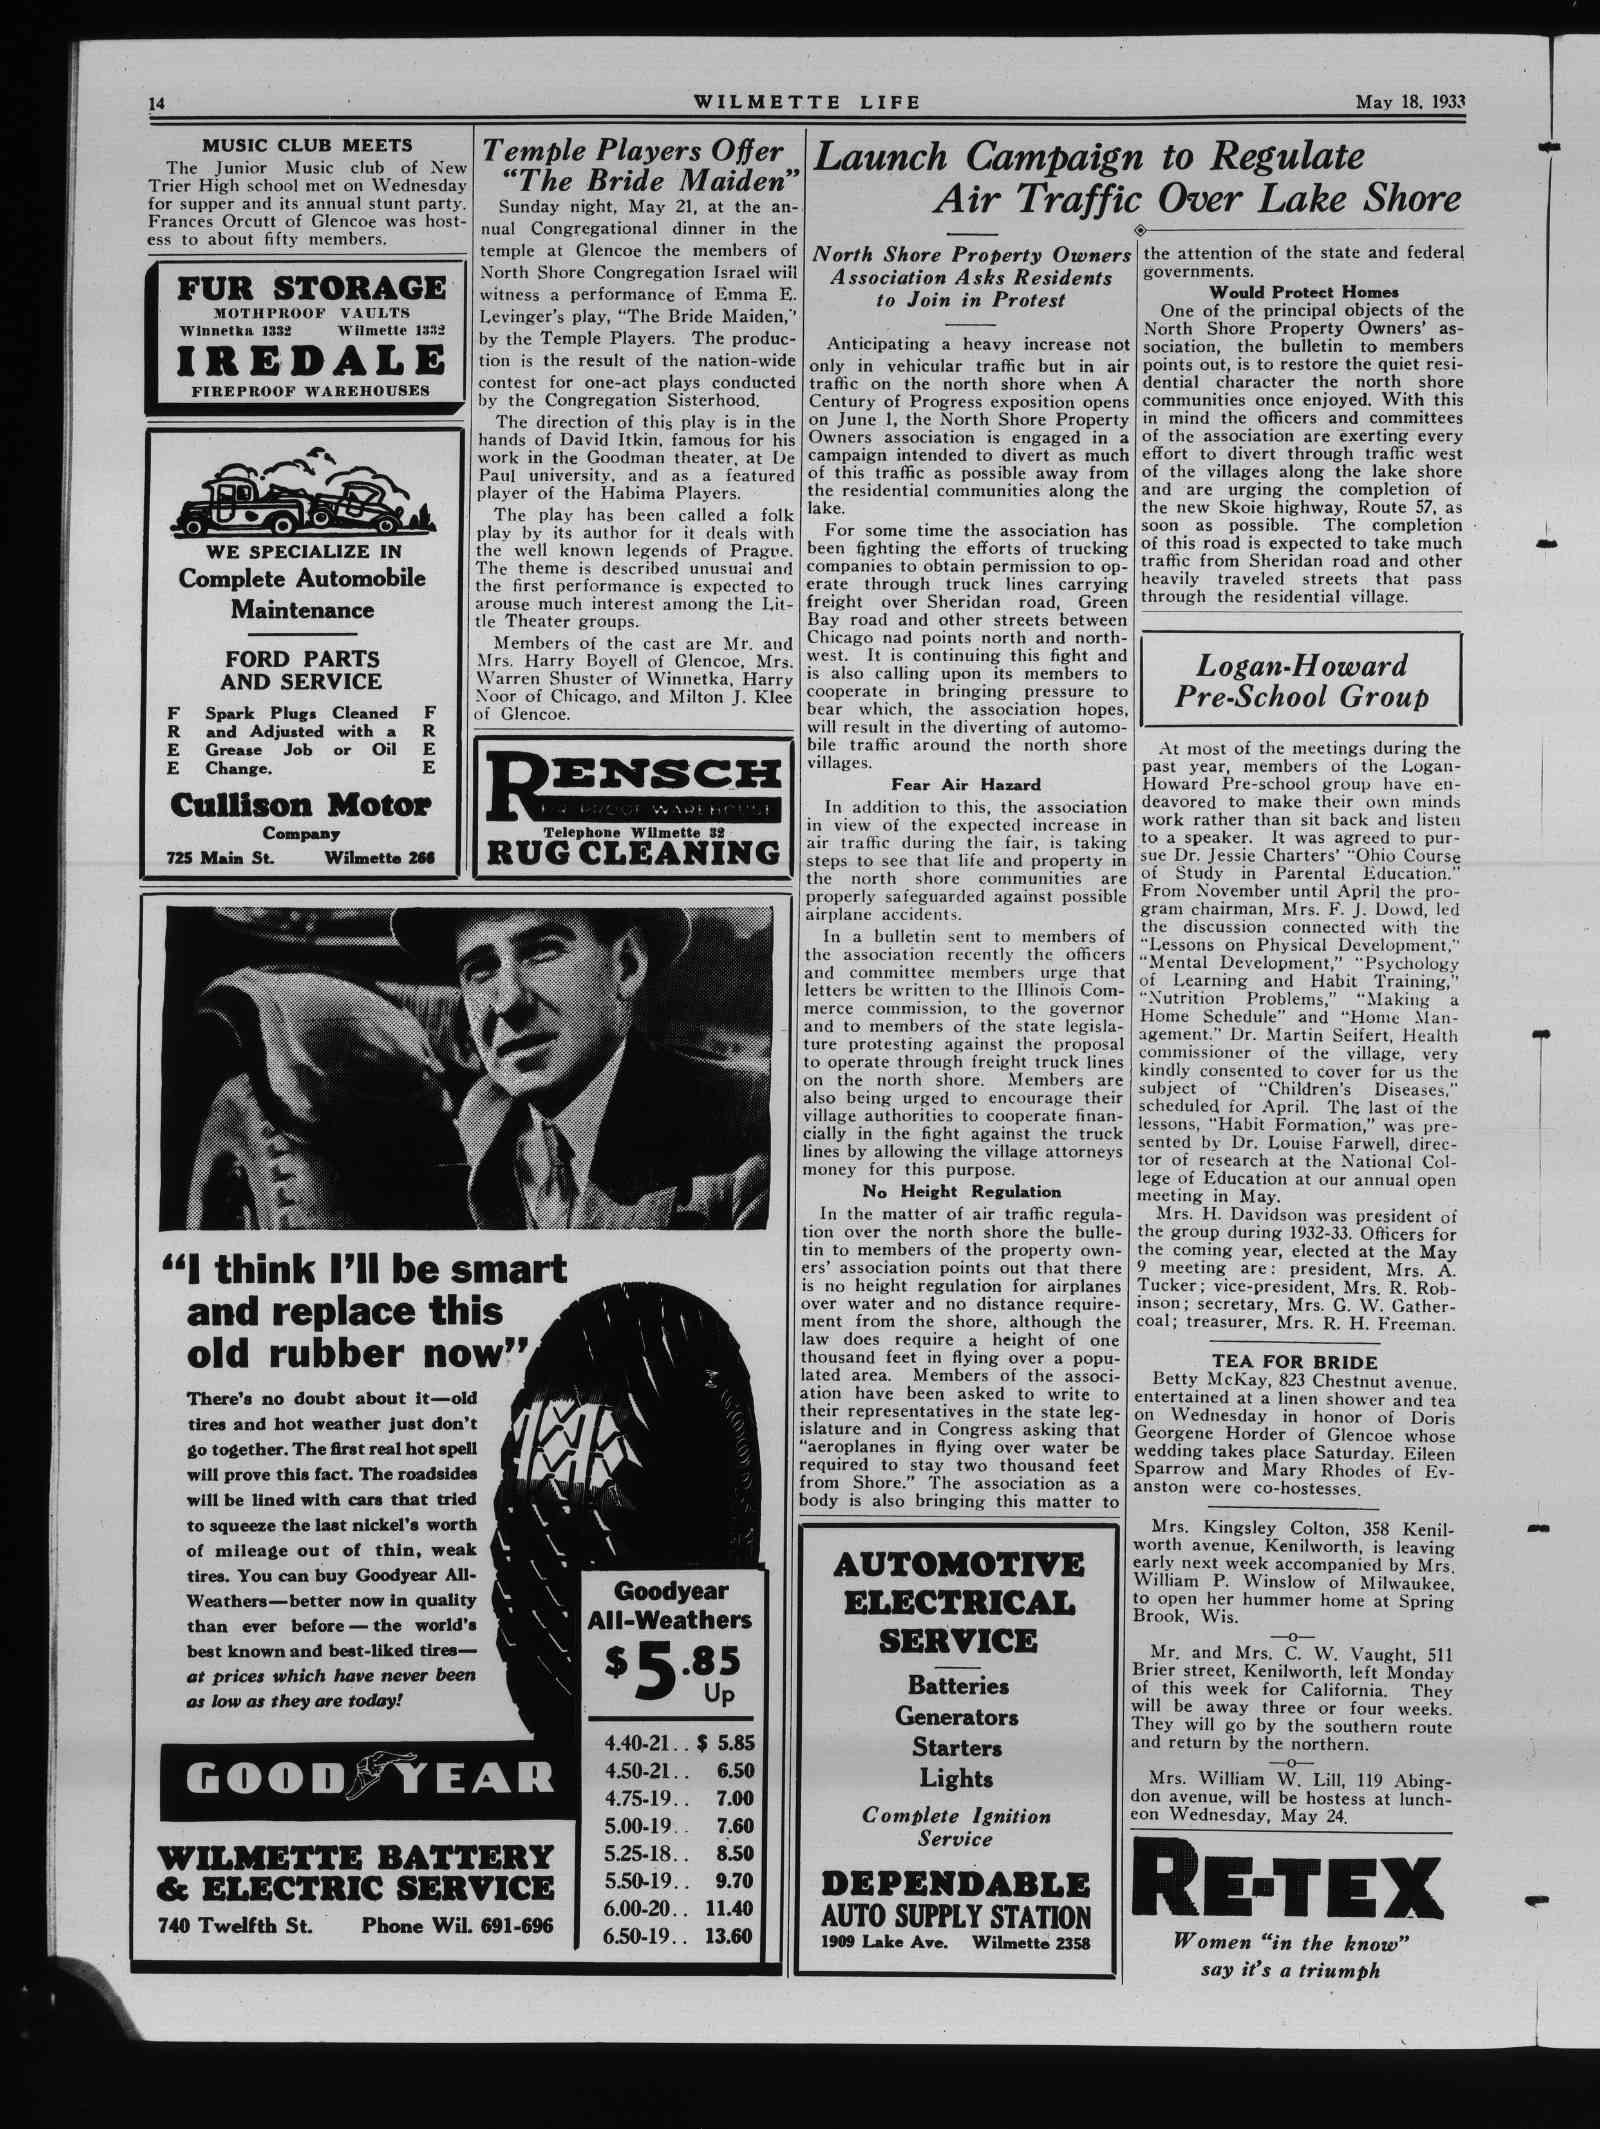 Wilmette Life (Wilmette, Illinois), 18 May 1933